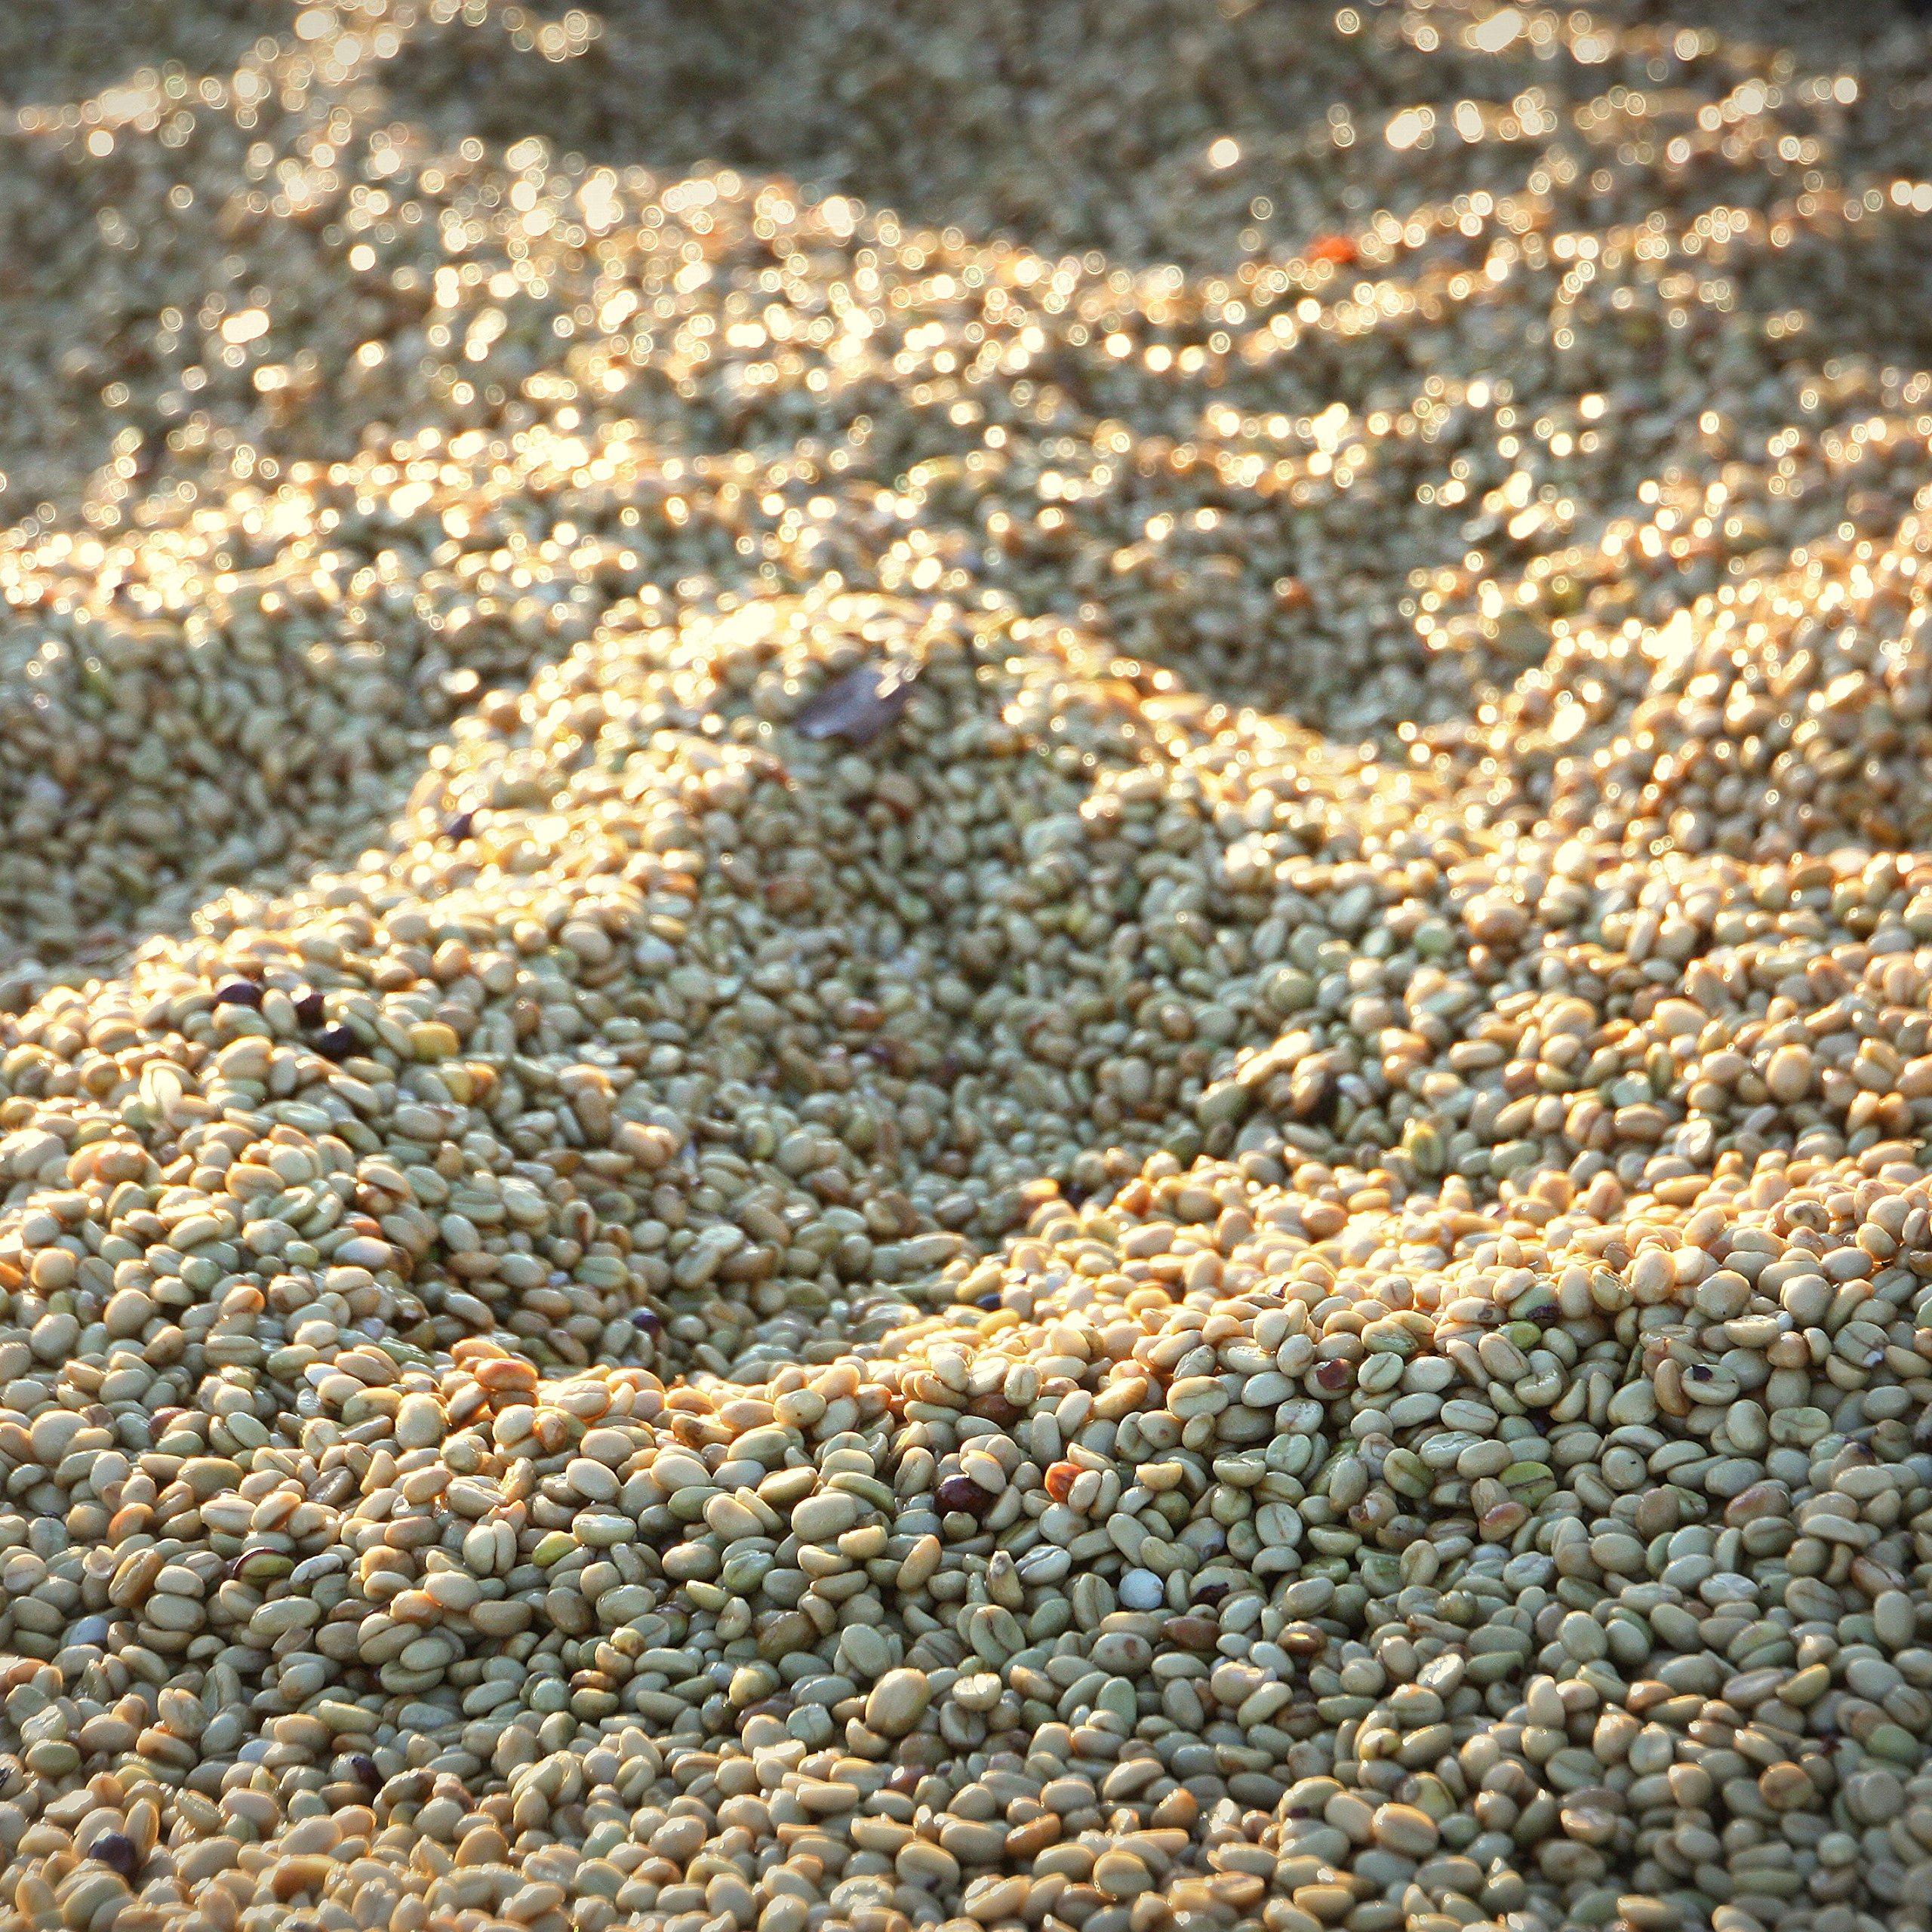 Rwanda Coko Honey (5 lb) Unroasted Green Coffee Beans 100% Specialty Arabica Caffeinated Beans